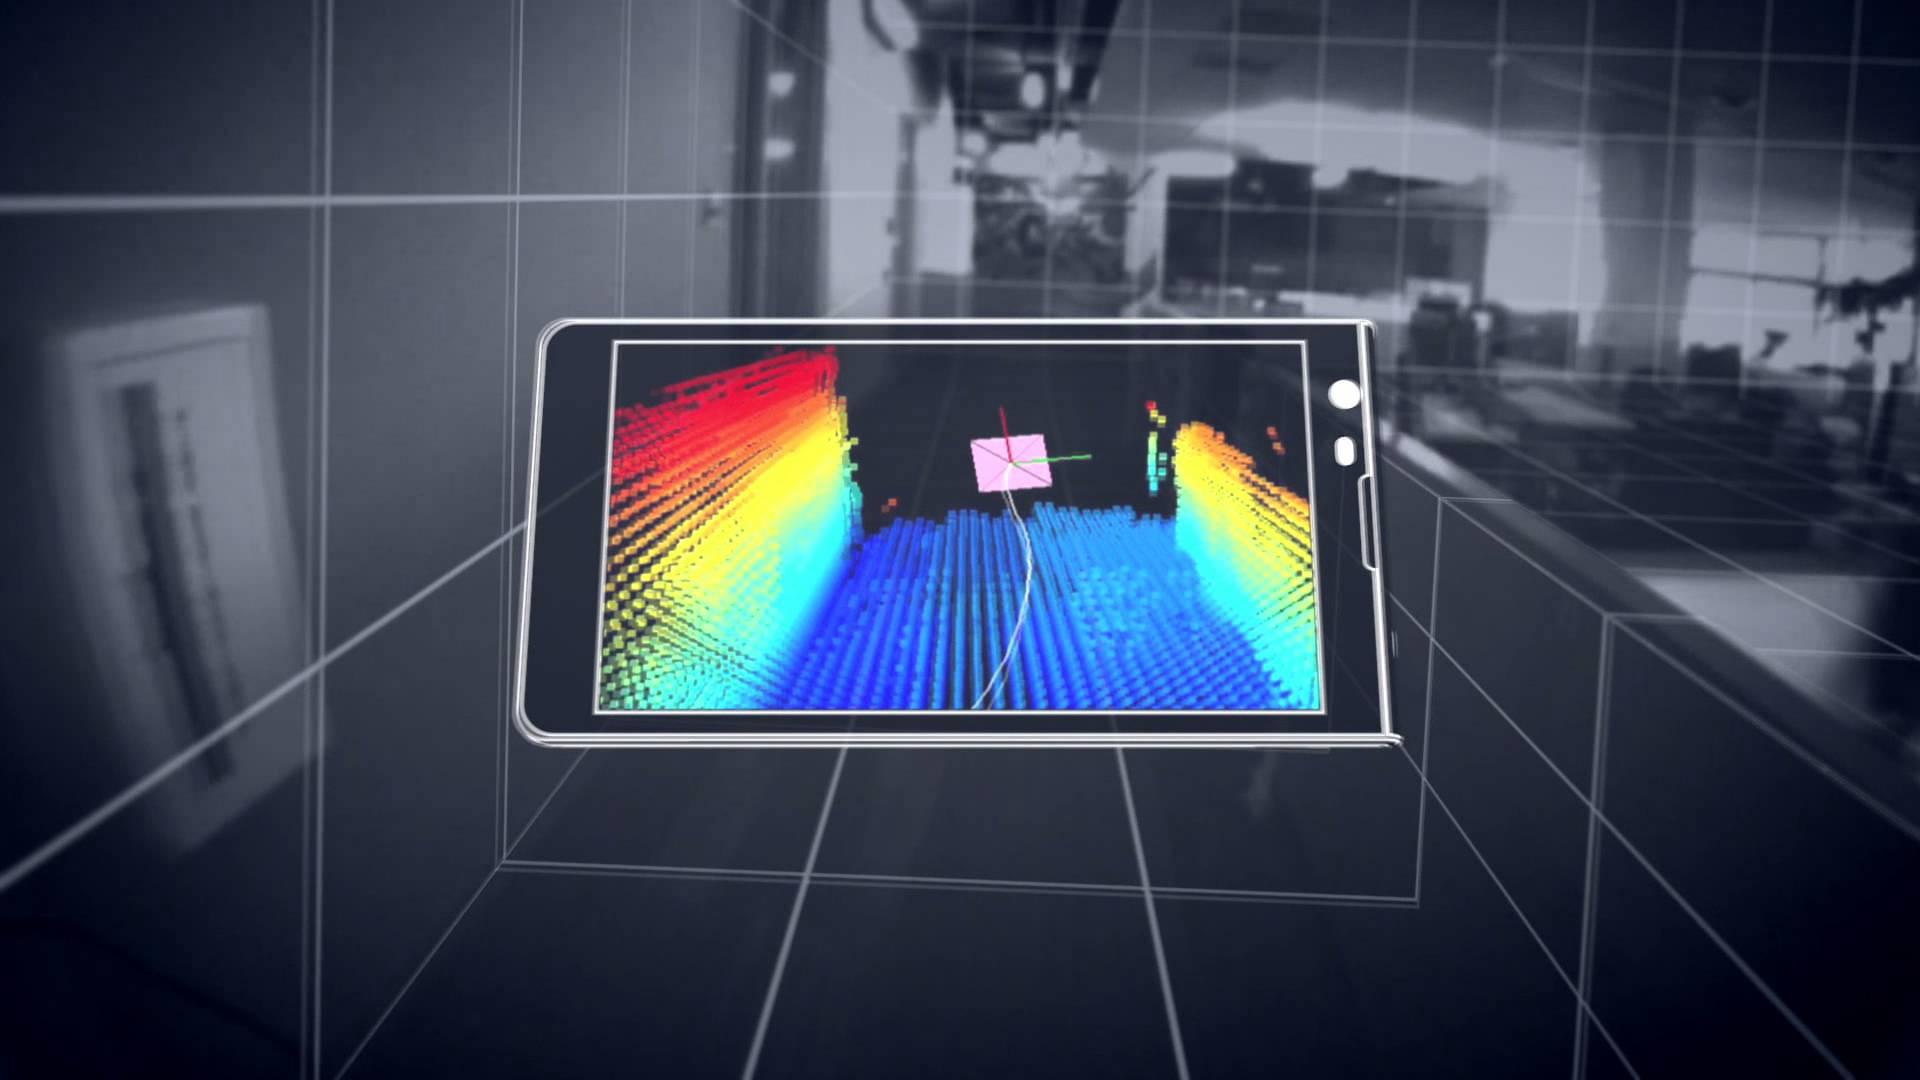 Google 3D Tablet - Project Tango